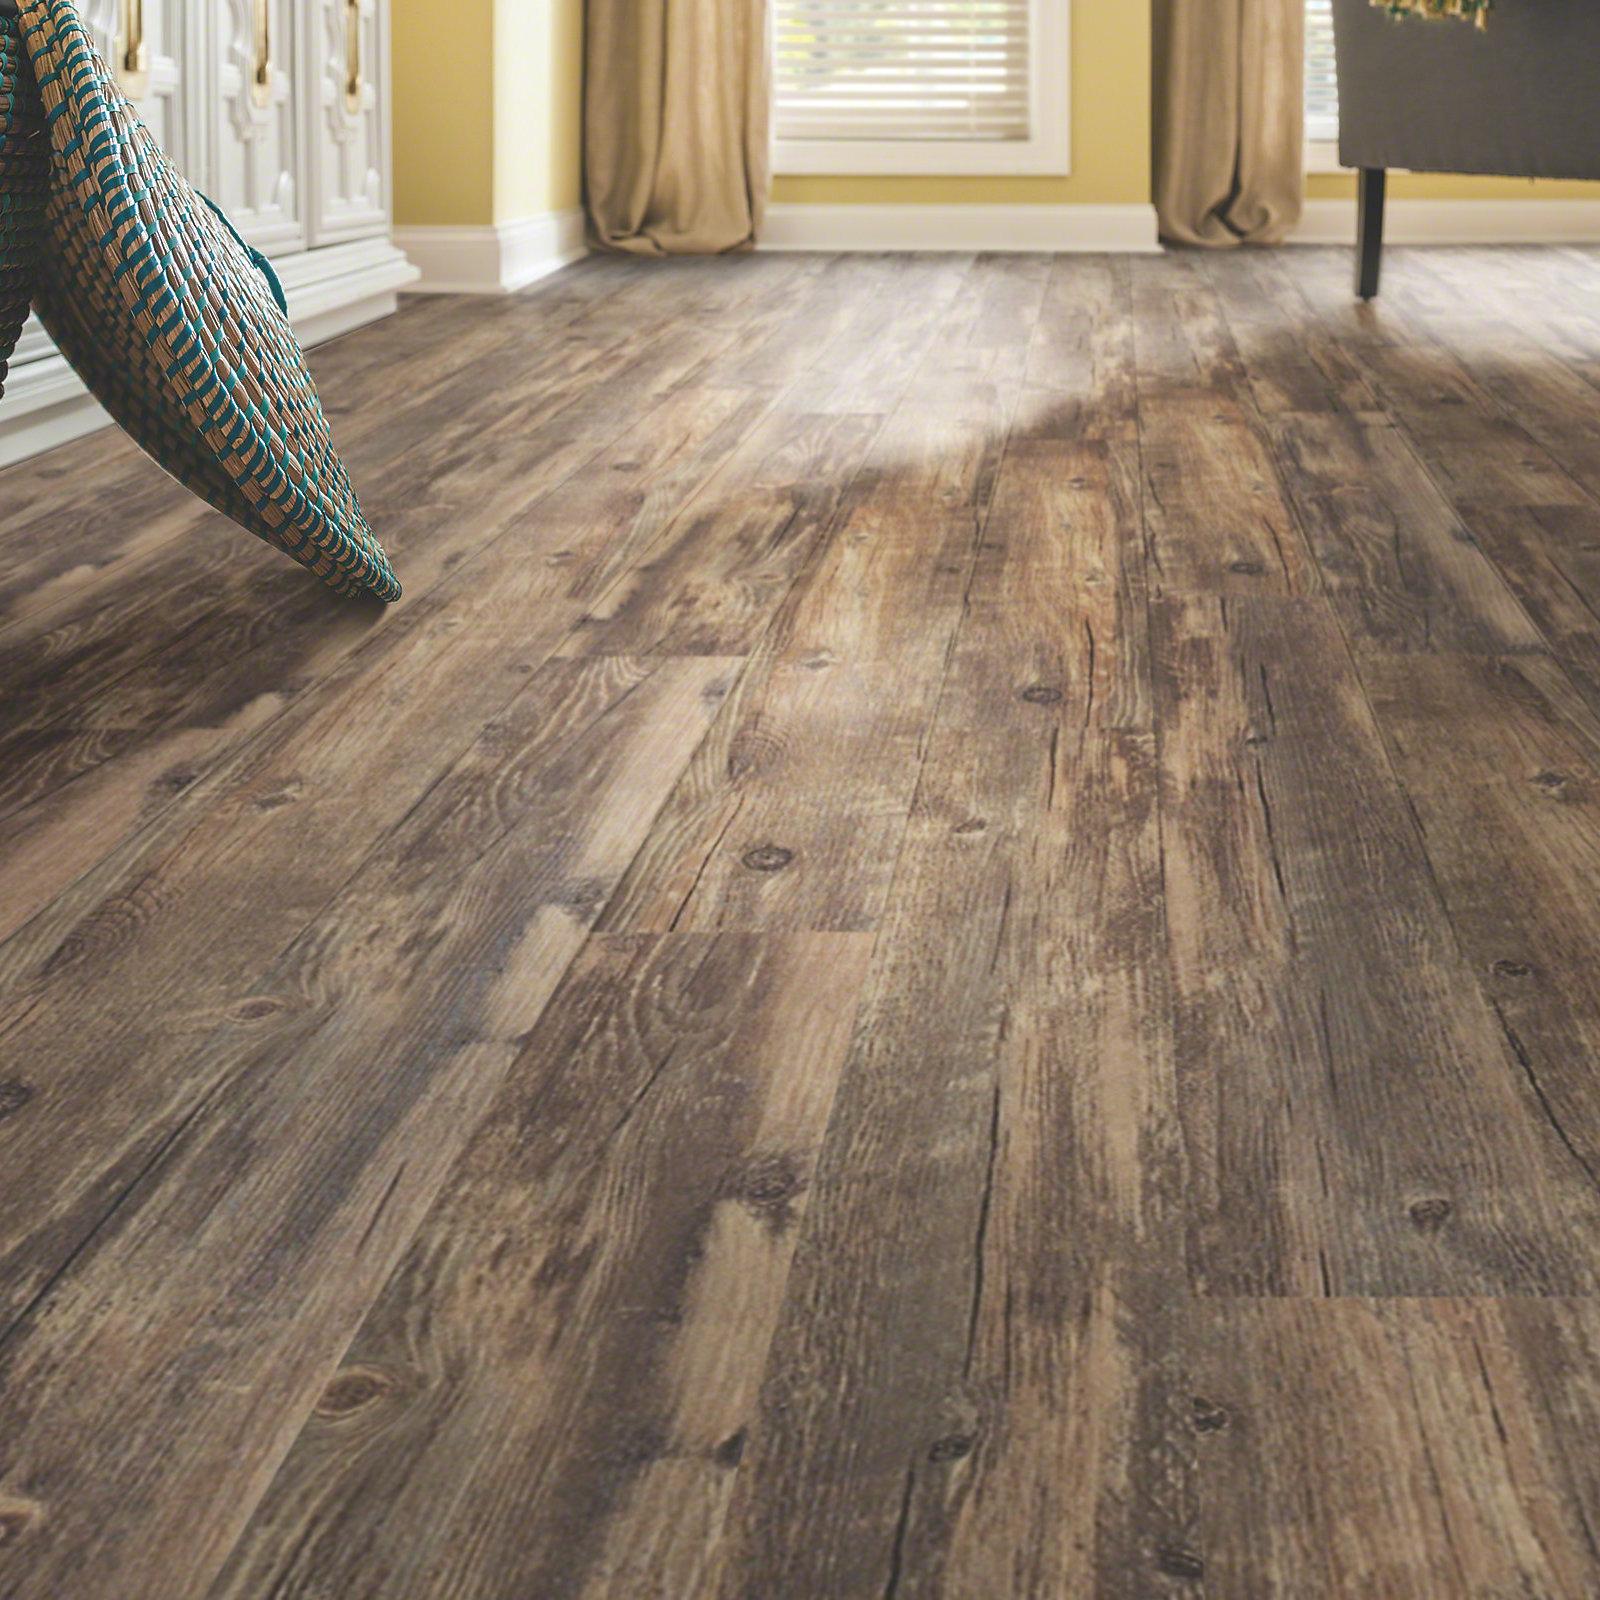 vinyl floors shaw floors worldu0027s fair 12 6 AGELVSH